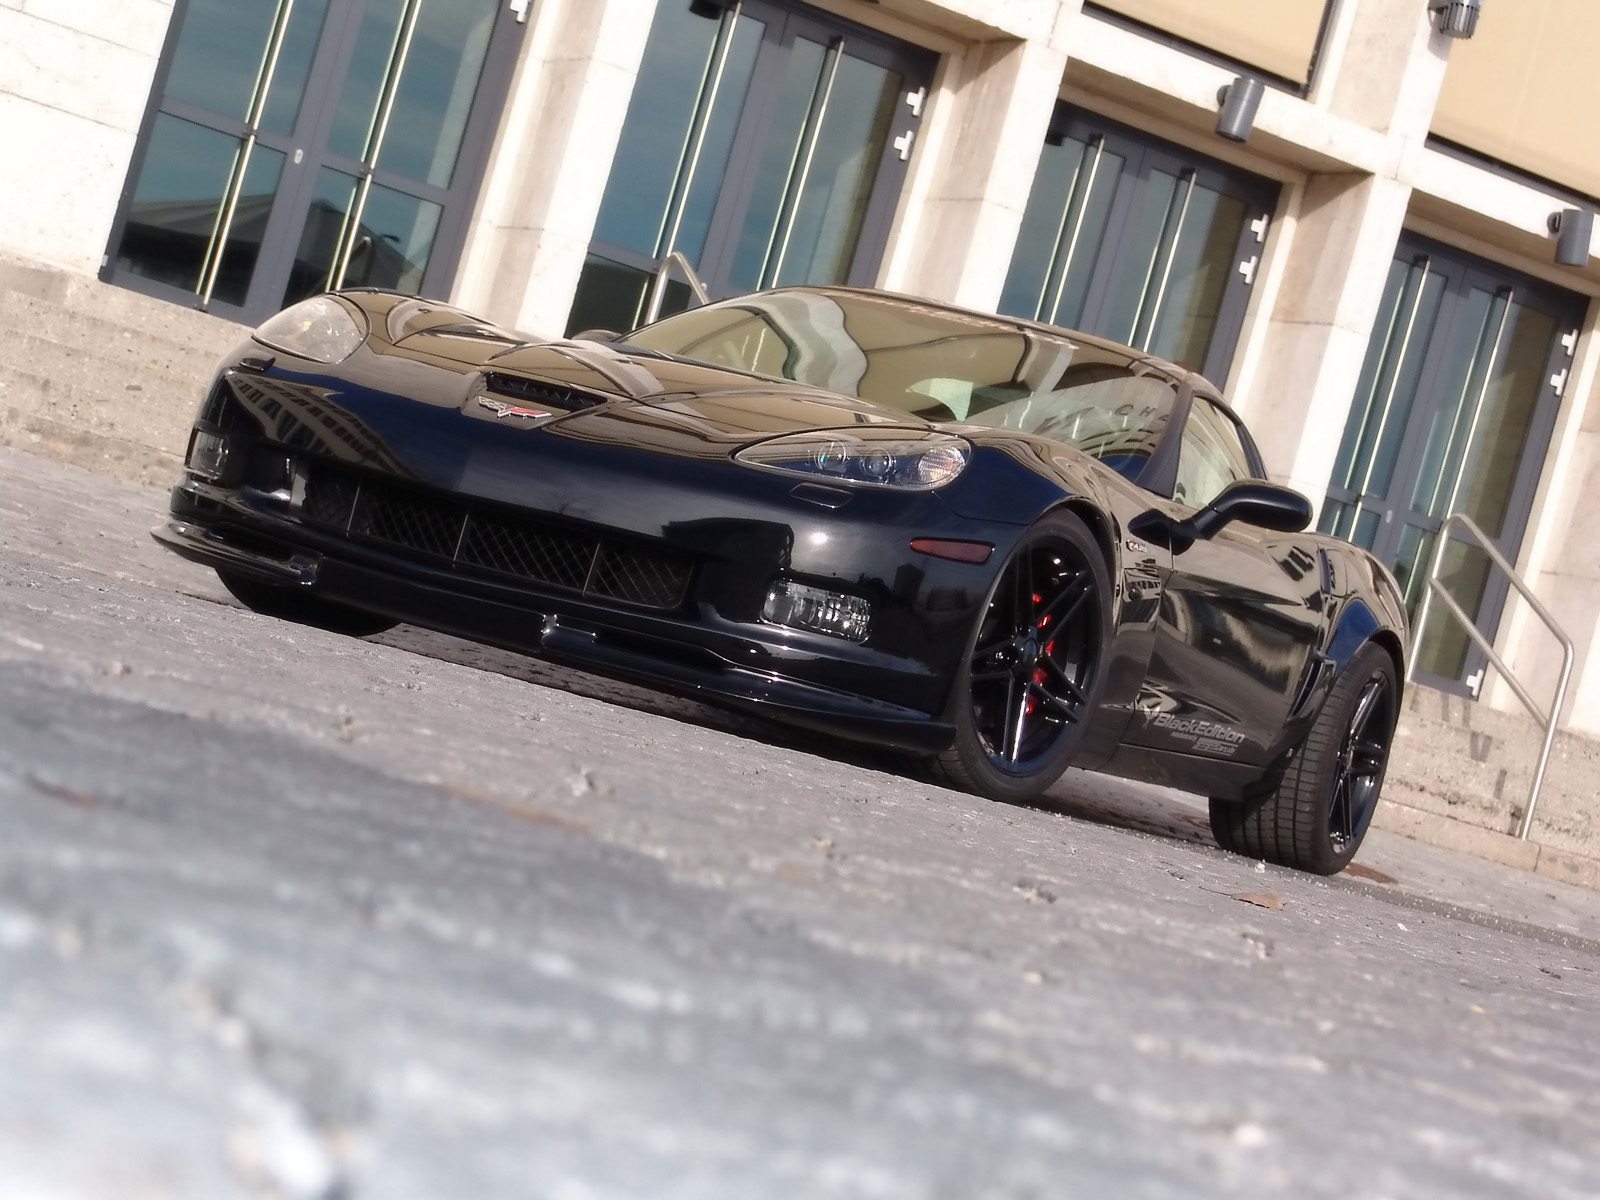 2008-GeigerCars-Corvette-Z06-Black-Edition-Front-Angle-Tilt-1600×1200.jpg